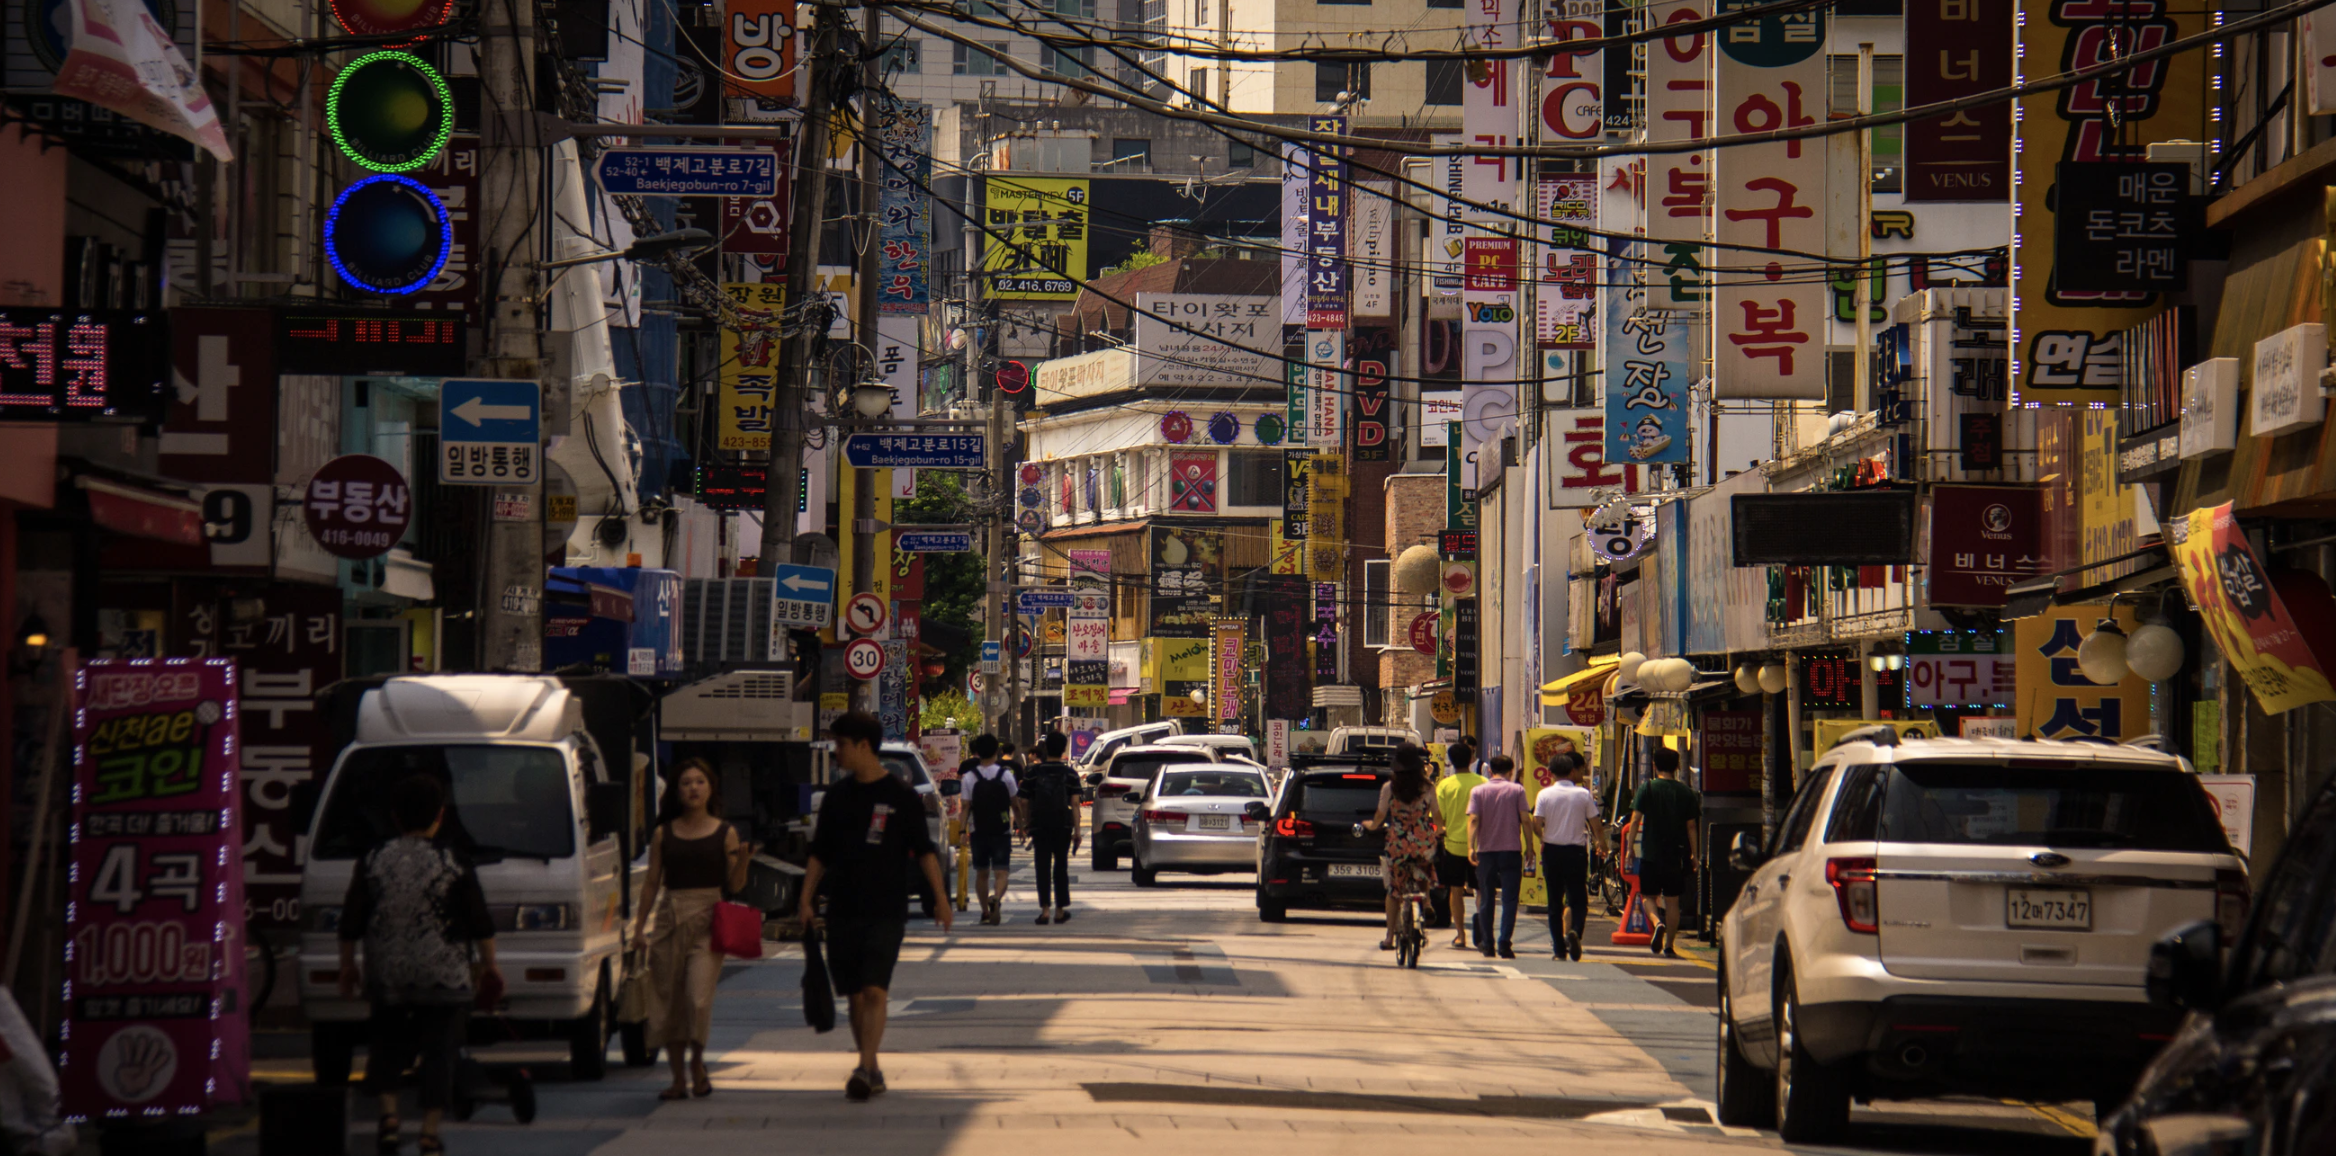 Singapore has advised public to avoid non-essential travel to Daegu city and Cheongdo county in South Korea. Photo courtesy: unsplash